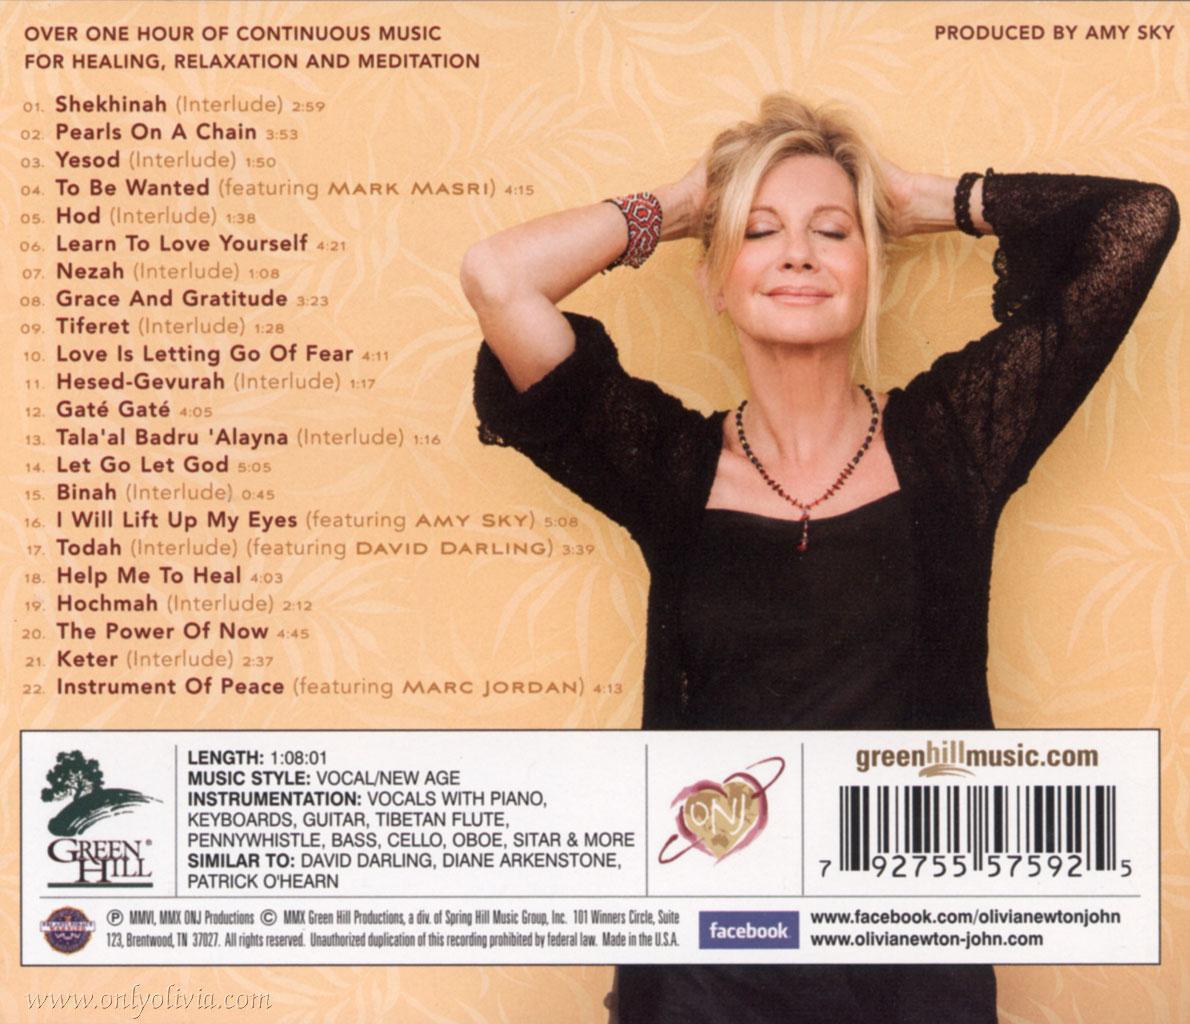 Olivia newton john gt music gt albums gt grace and gratitude renewed